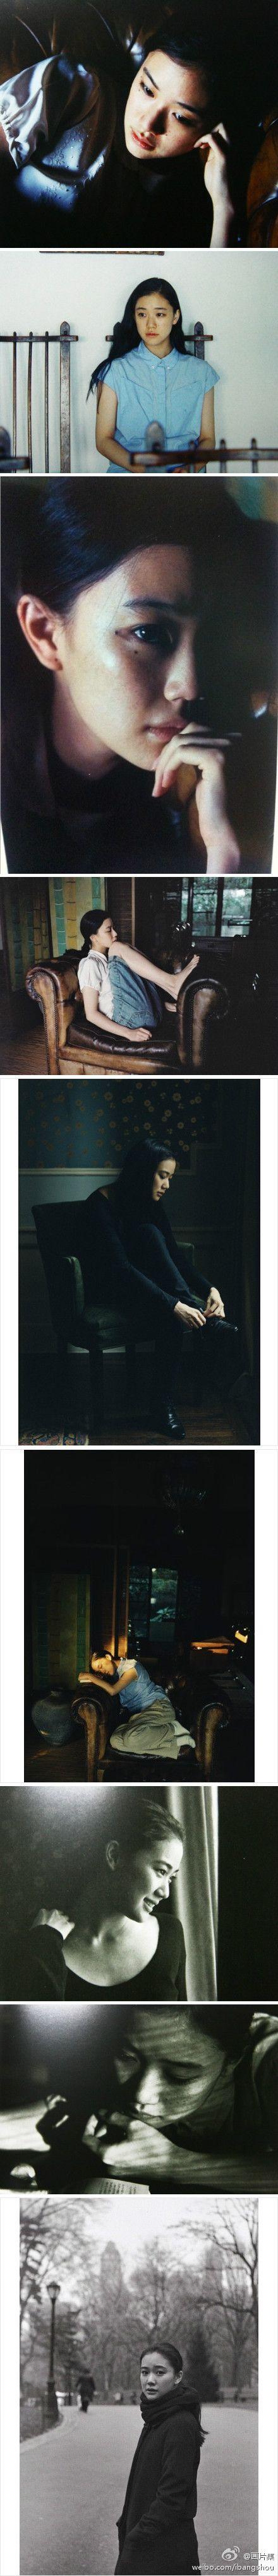 Yu Aoi. 苍井优